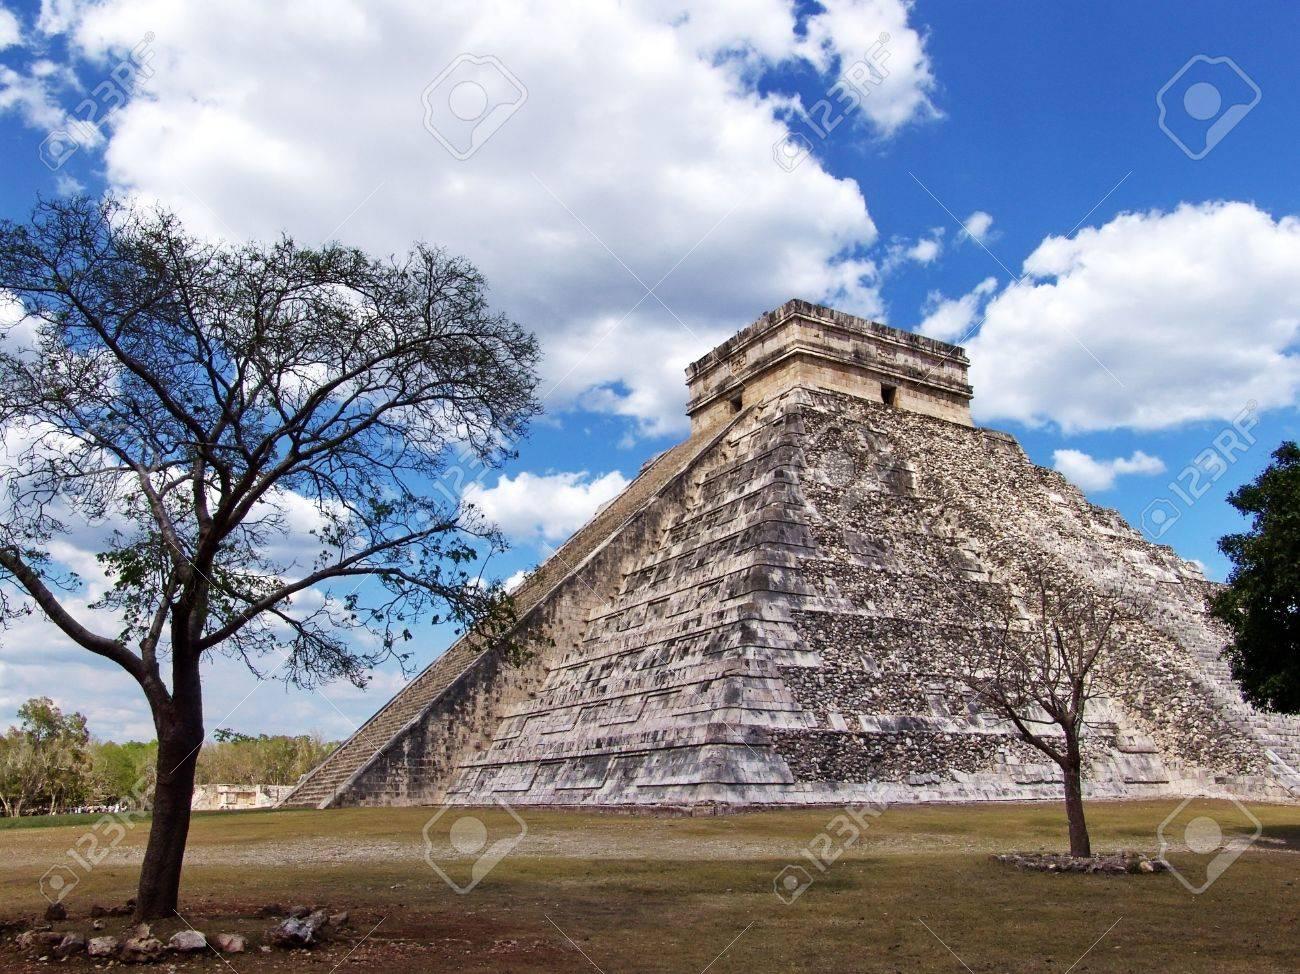 Pyramid of Kukulkan at Chichen Itza. Mayan culture, Chichen Itza, Yucatan Peninsula, Mexico. Travel Destination. Stock Photo - 5425688